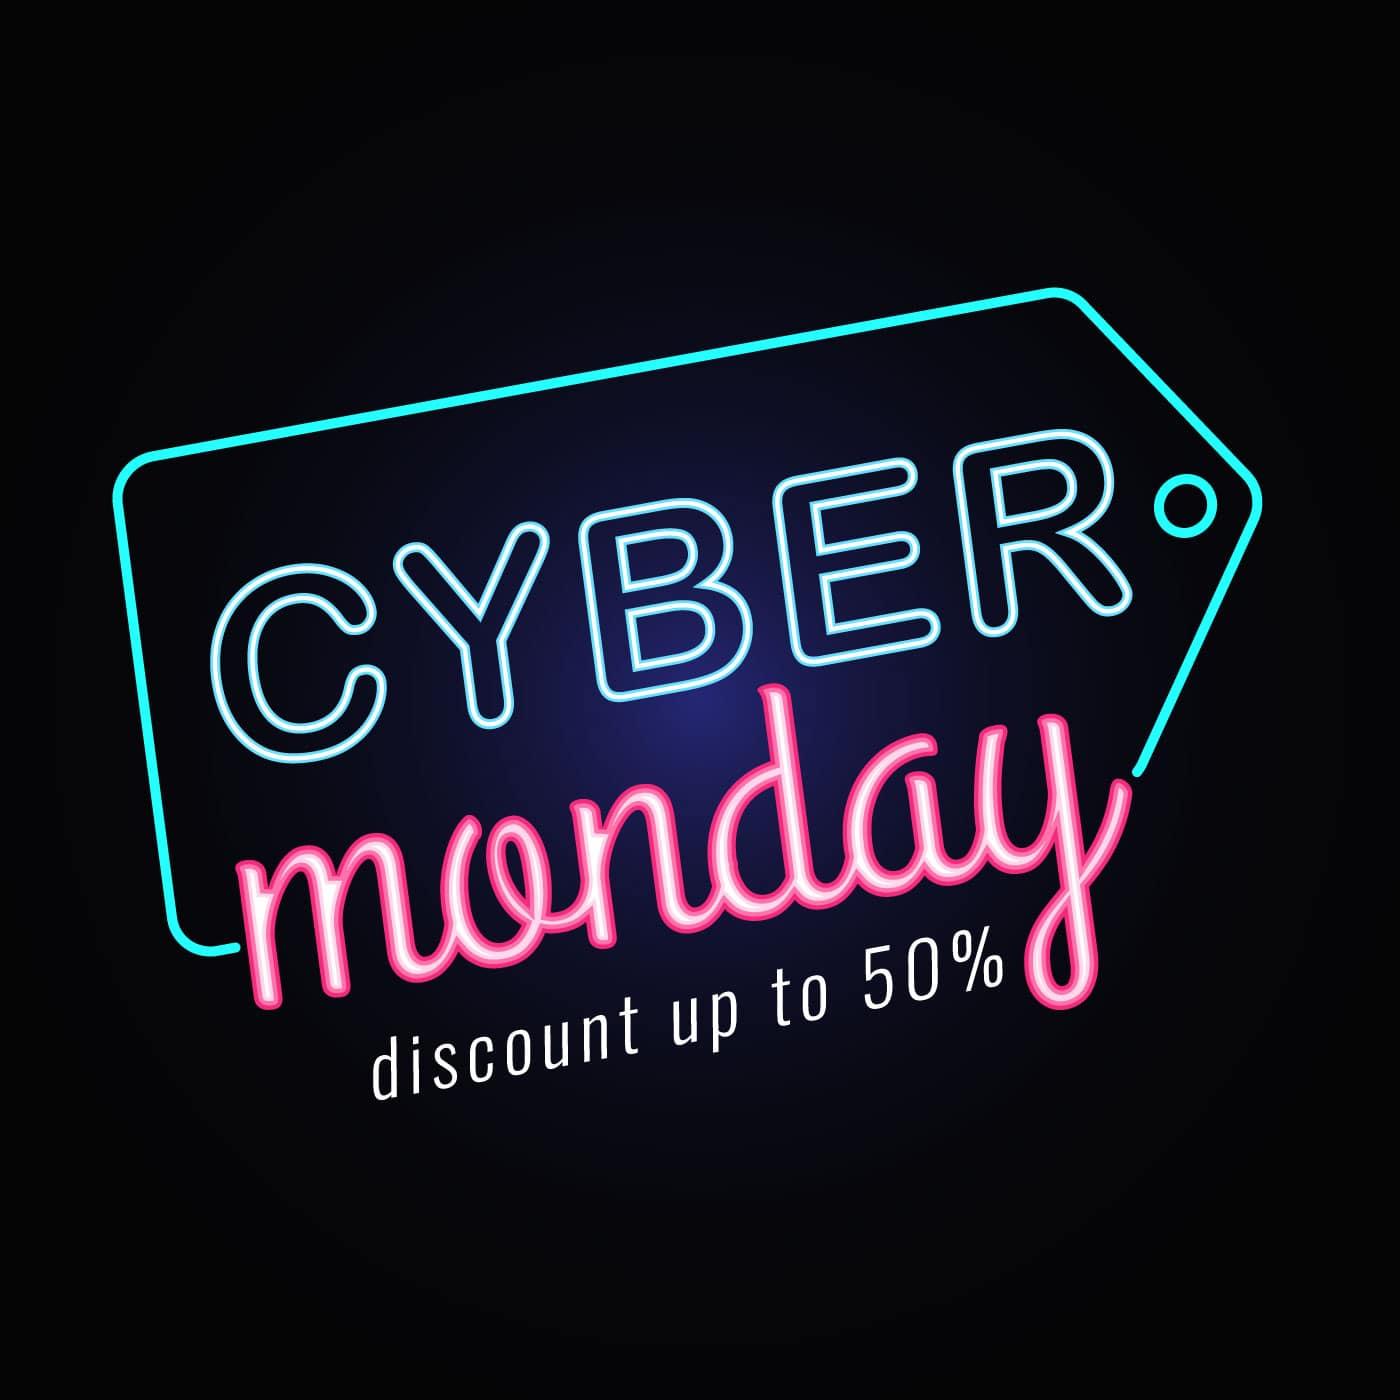 Cyber Monday Web Sale